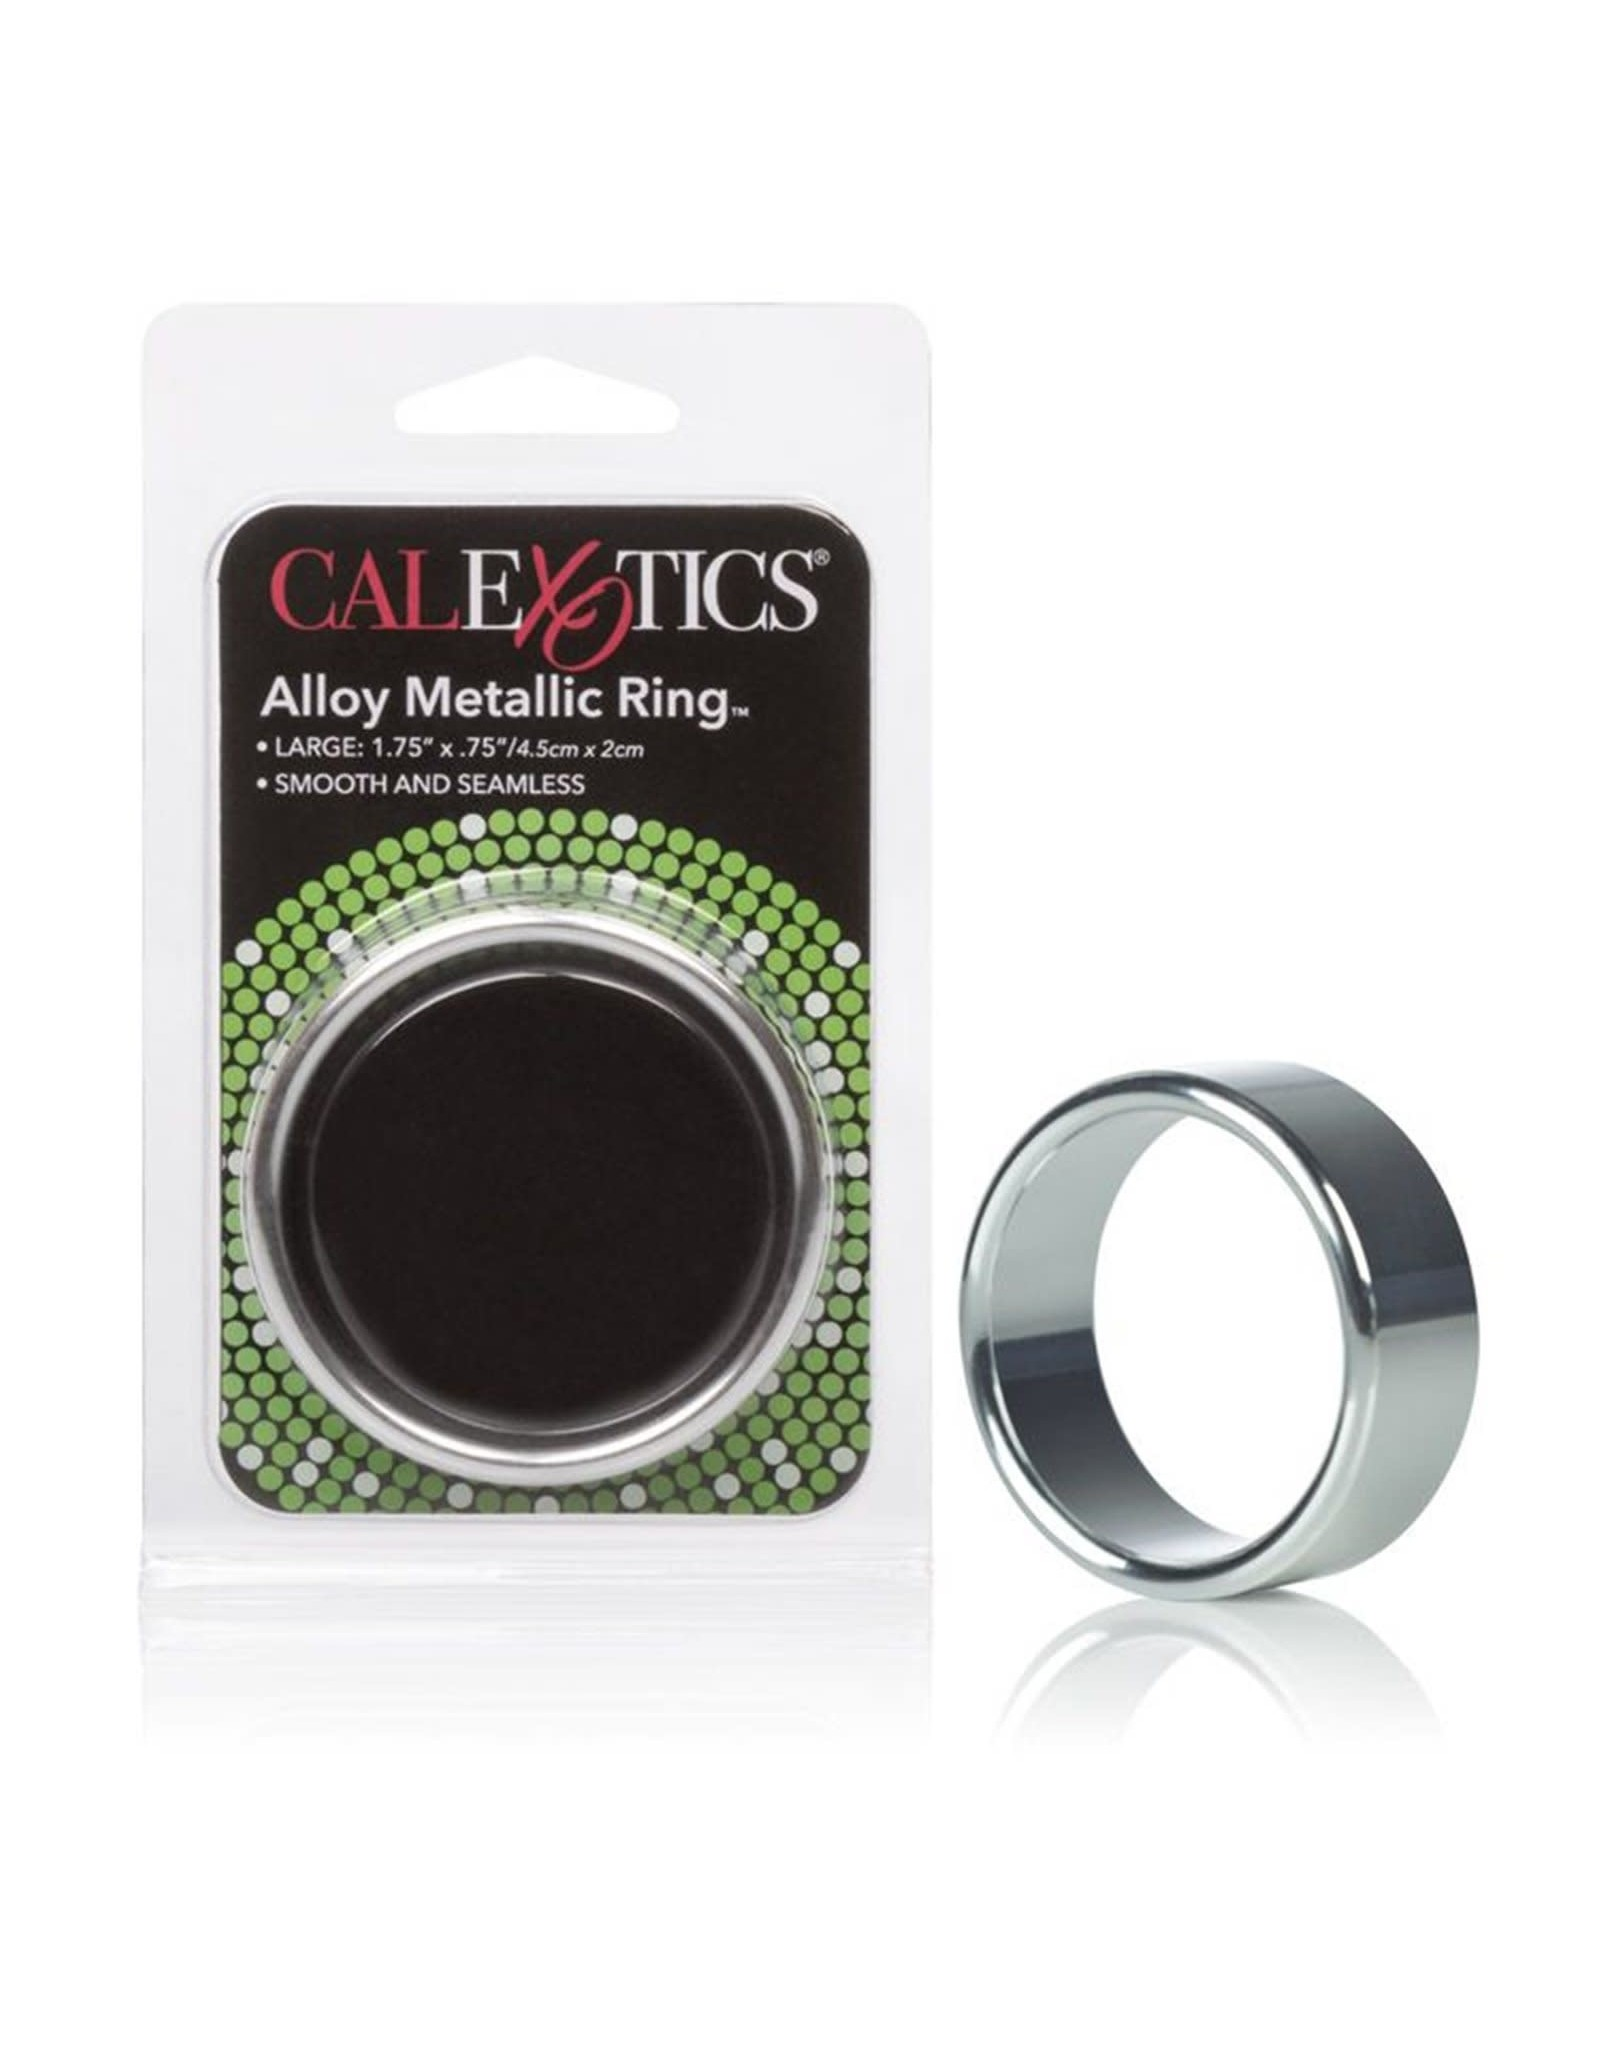 "CALEXOTICS CALEXOTICS - ALLOY METALLIC RING - LARGE 1.75""X.75"""